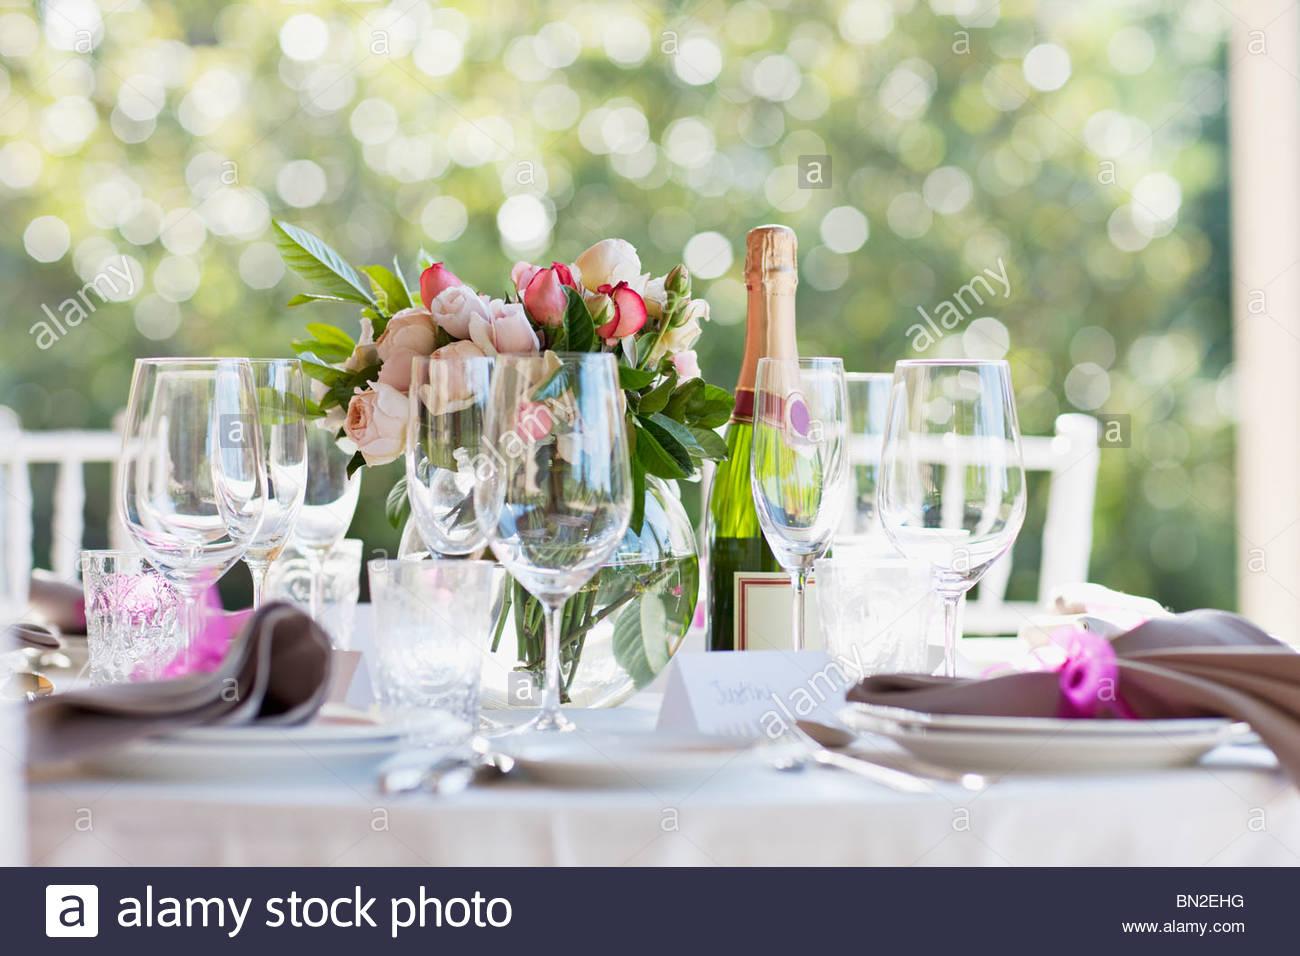 Close up of wedding reception place setting - Stock Image